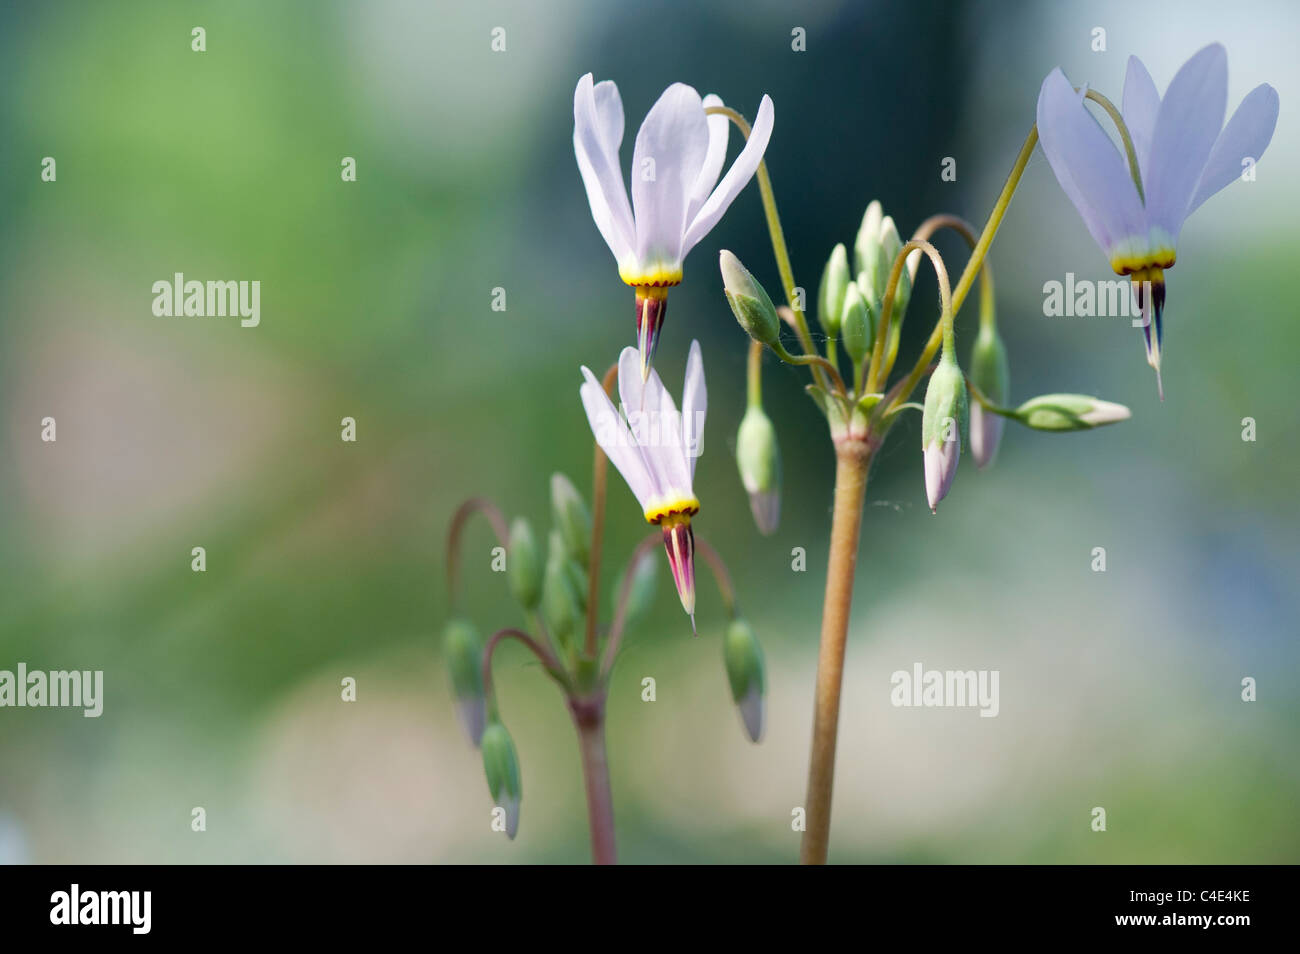 Dodecatheon pulchellum flowers. Dark-throat shooting star flowers - Stock Image